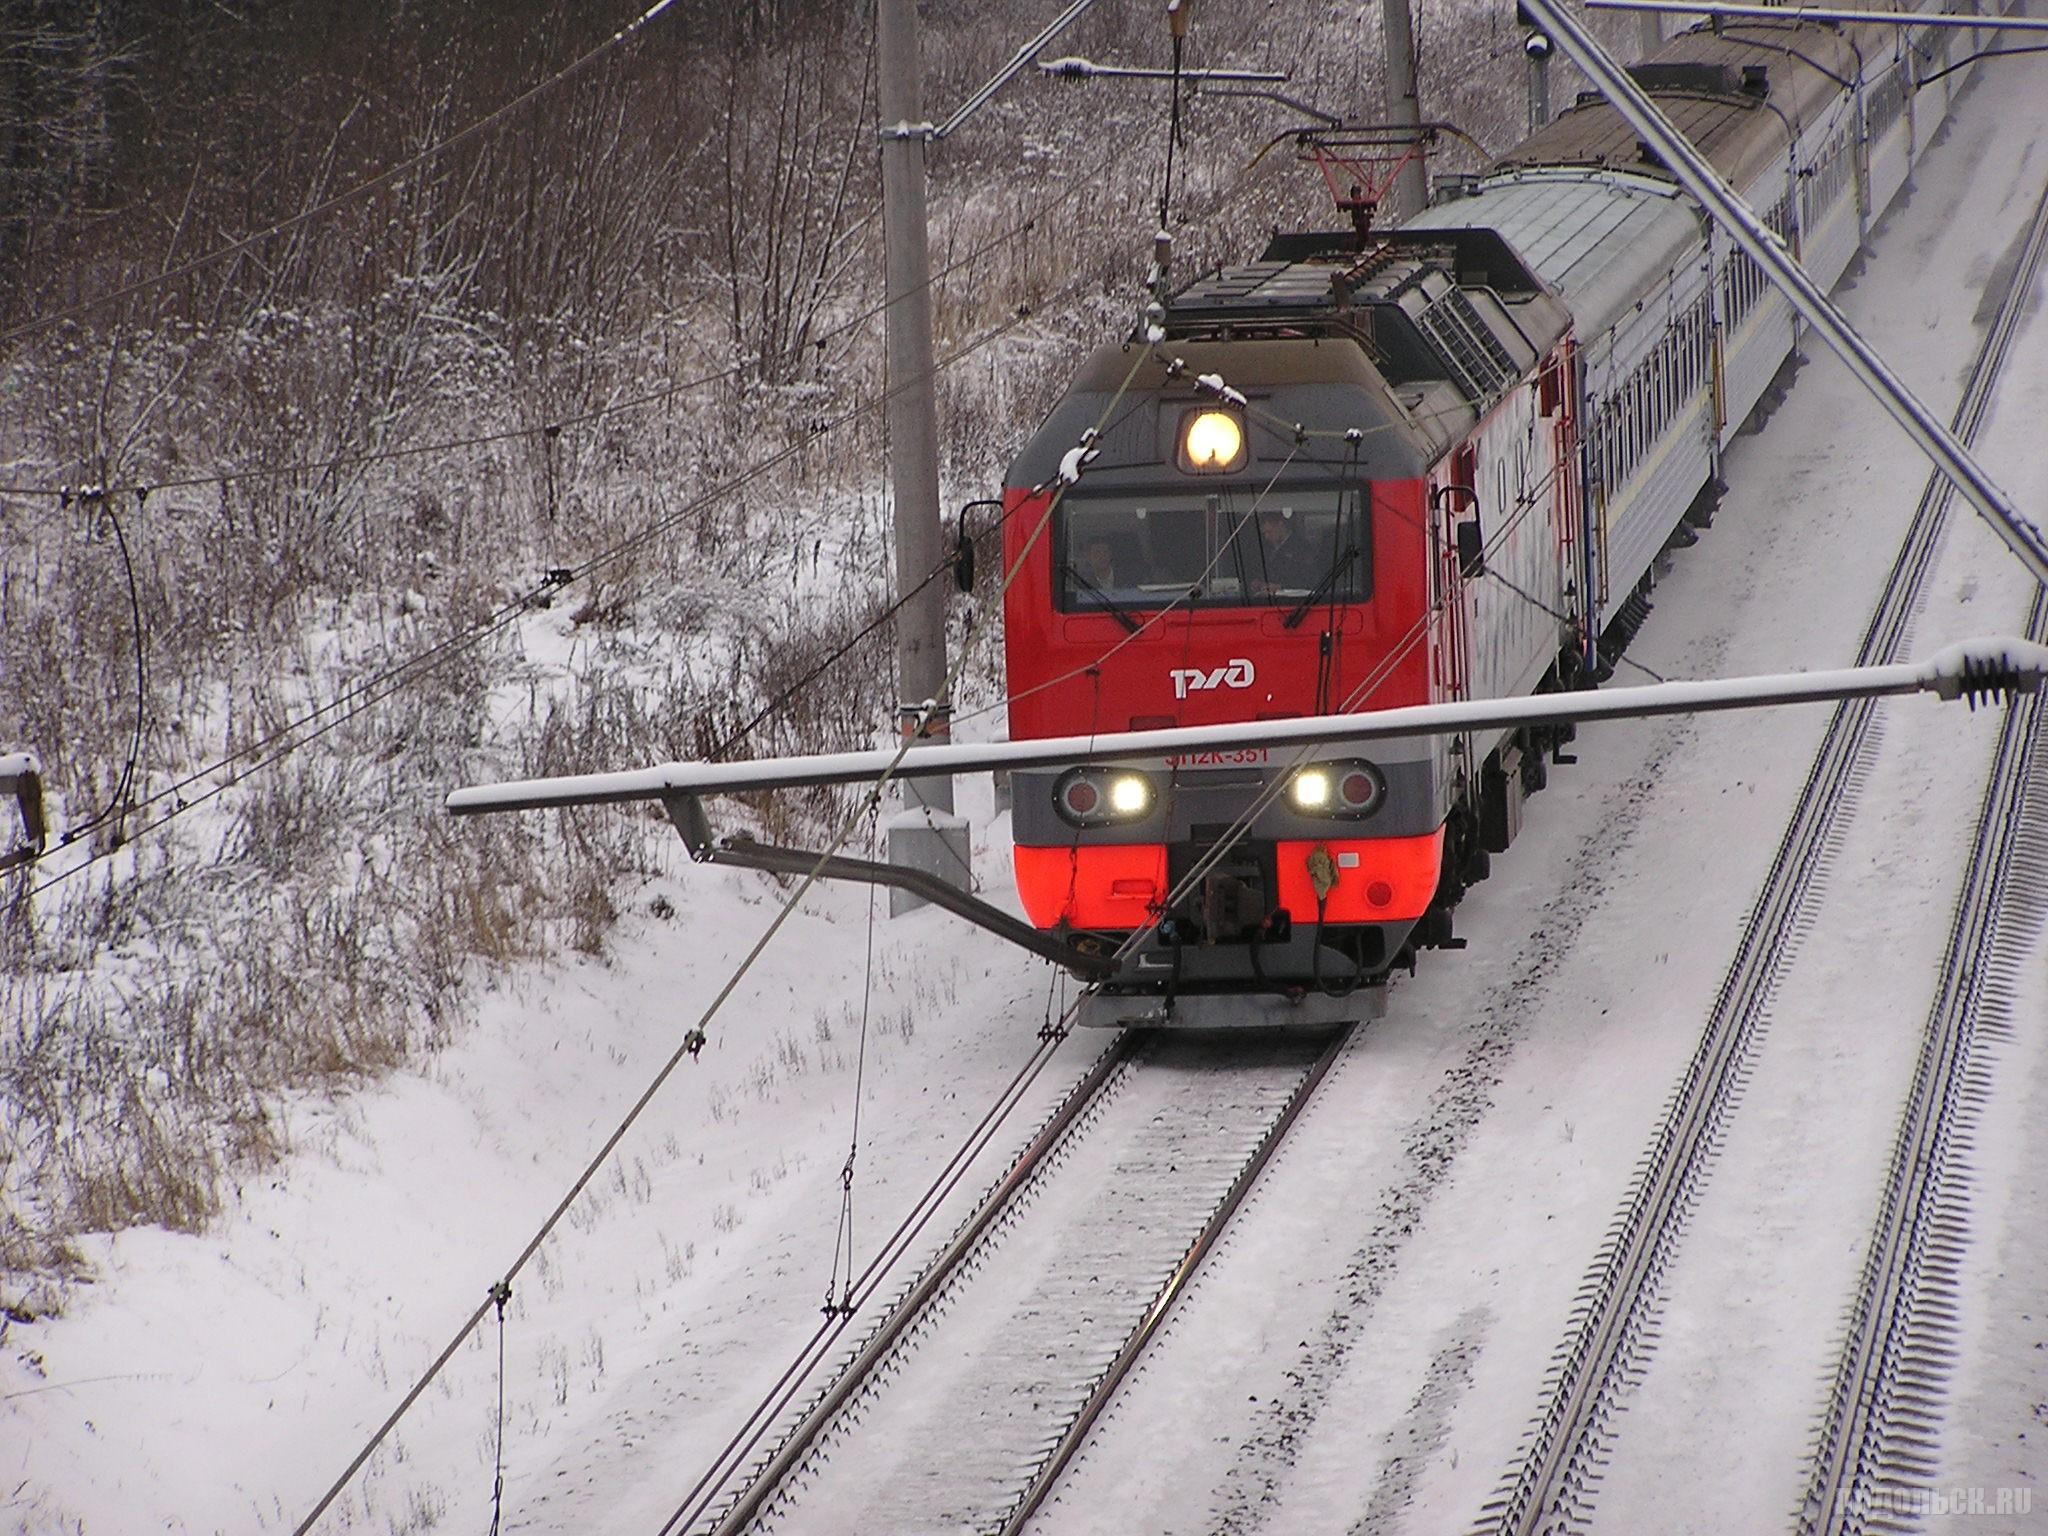 Украинский поезд на перегоне Гривно - Весенняя. 07.12.2017.